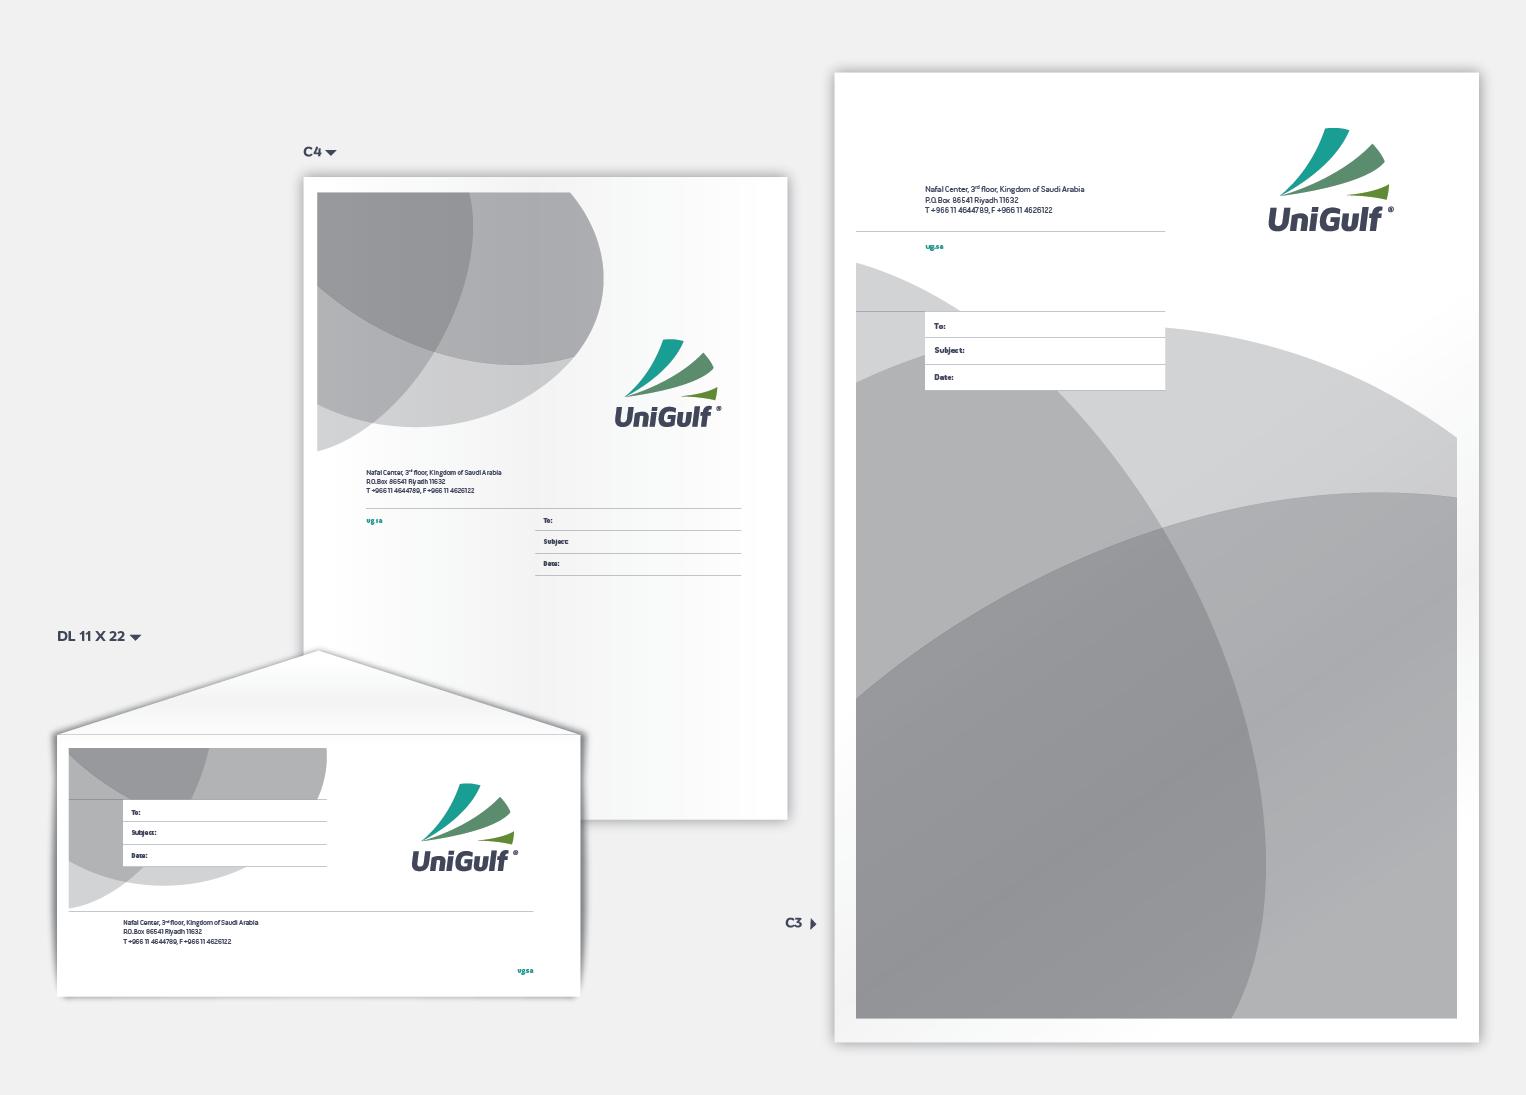 UniGulf-_-Envelopes.png